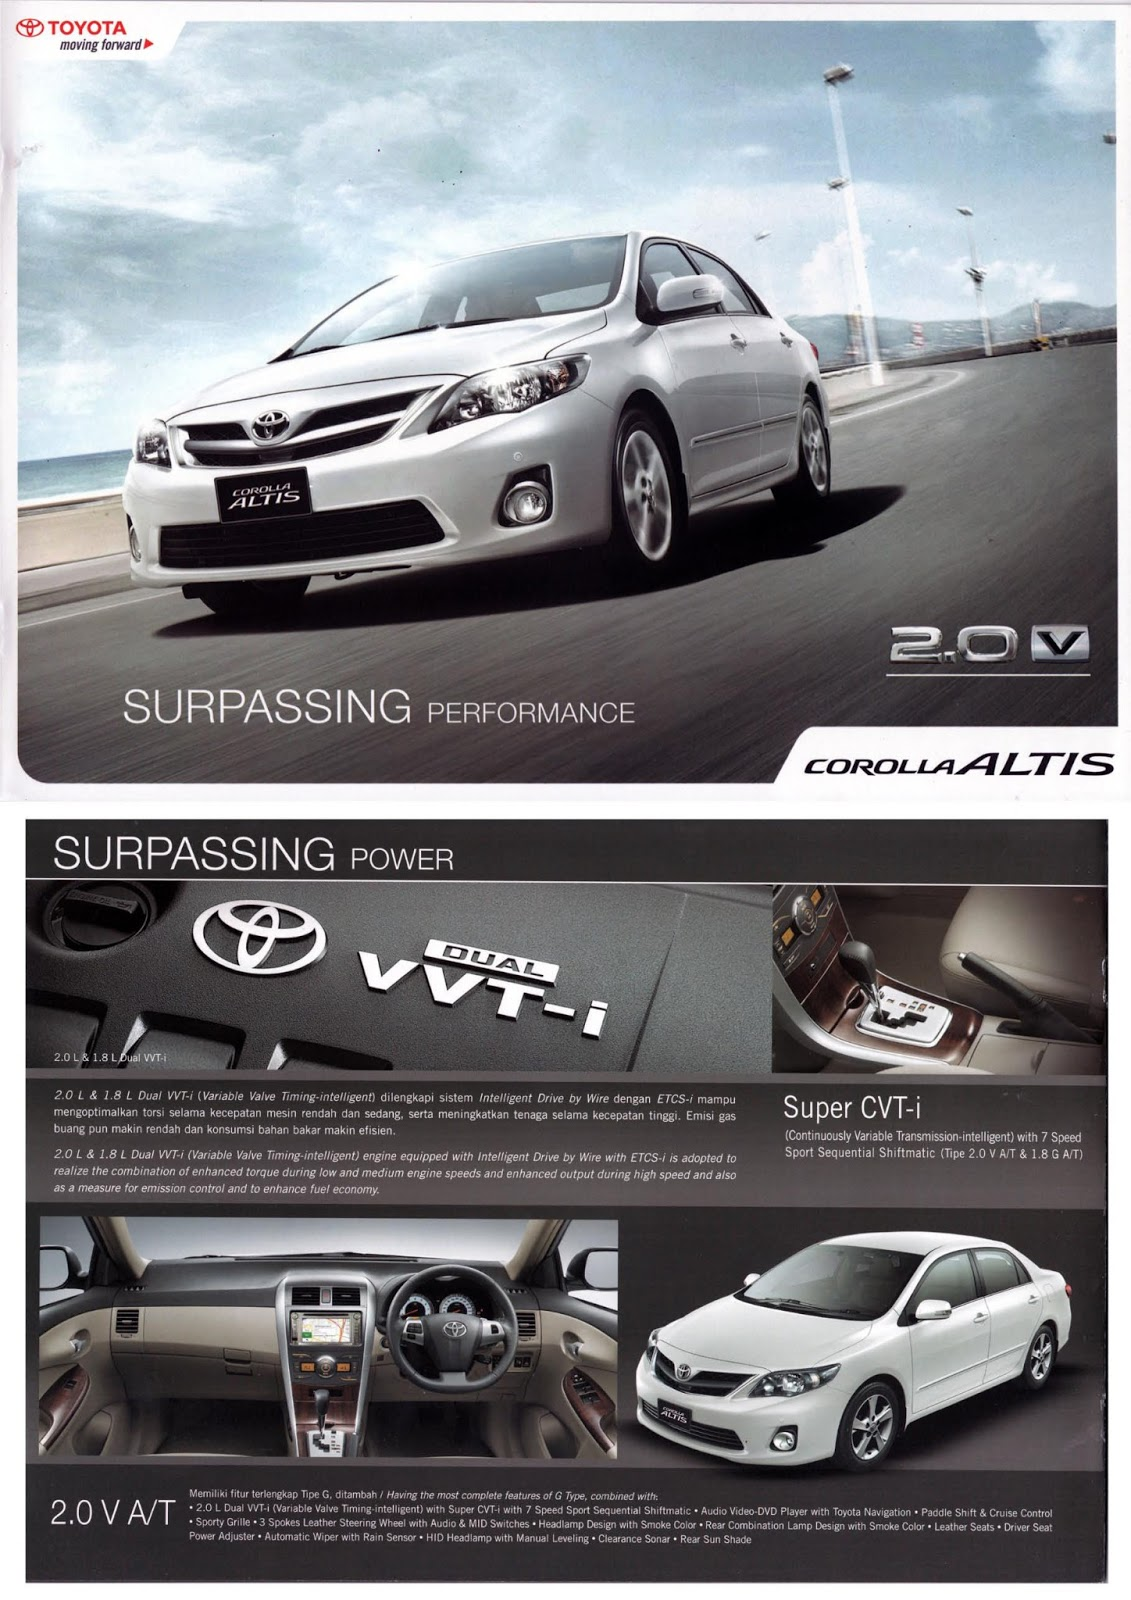 Harga Grand New Avanza Surabaya All Yaris Trd Sportivo 2018 Brosur Toyota Corolla Altis 2013 Promo Dealer